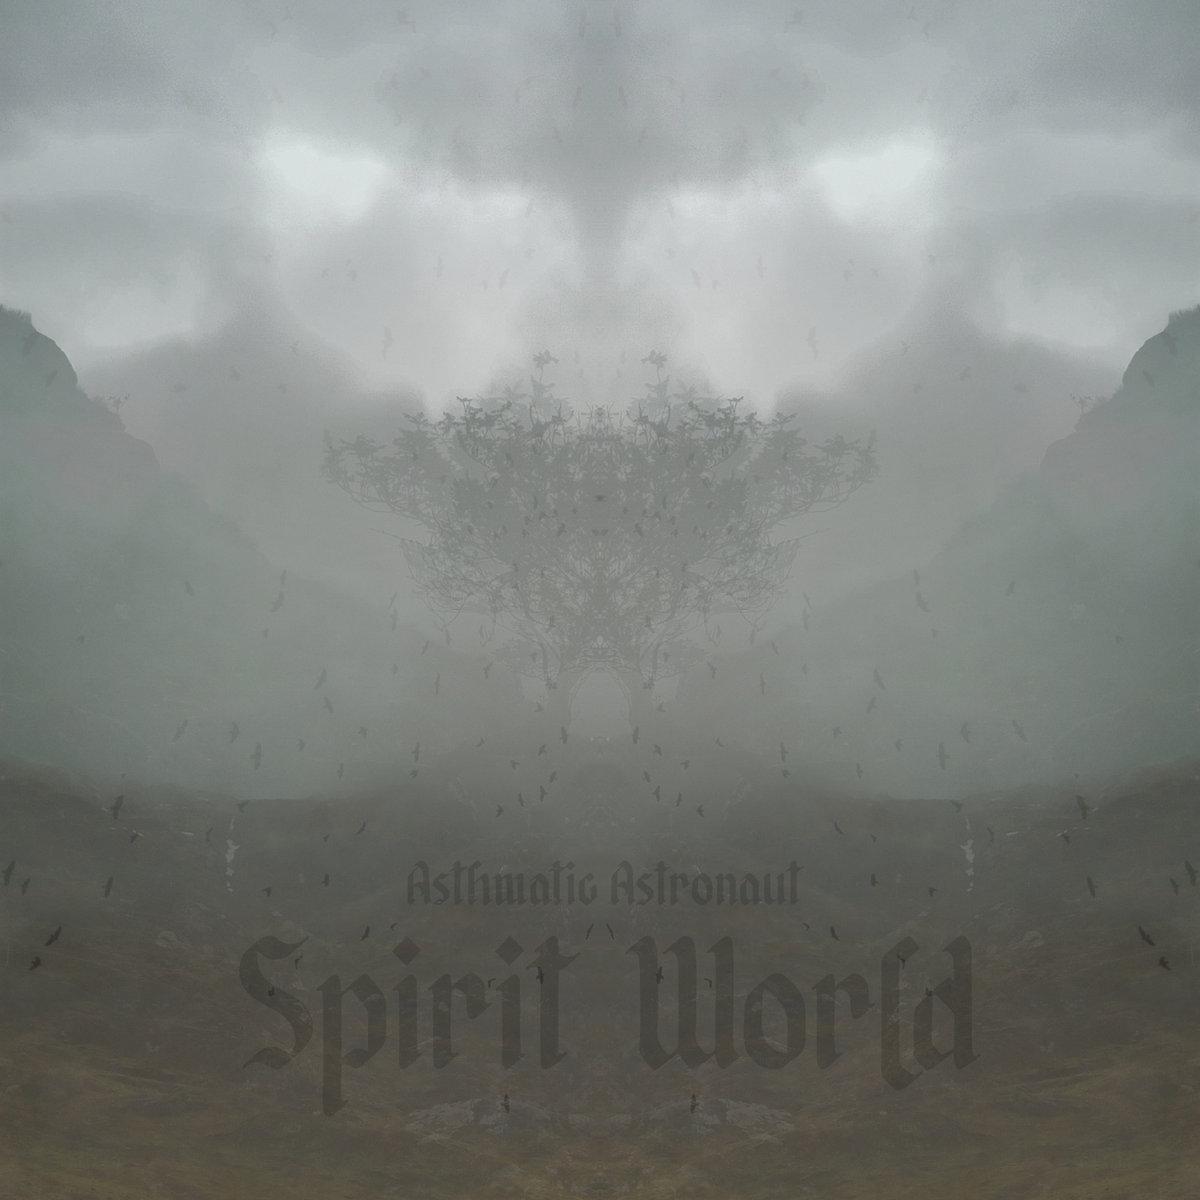 Asthmatic Astronaut – 'Spirit World'. Pre-release AlbumHighlight.